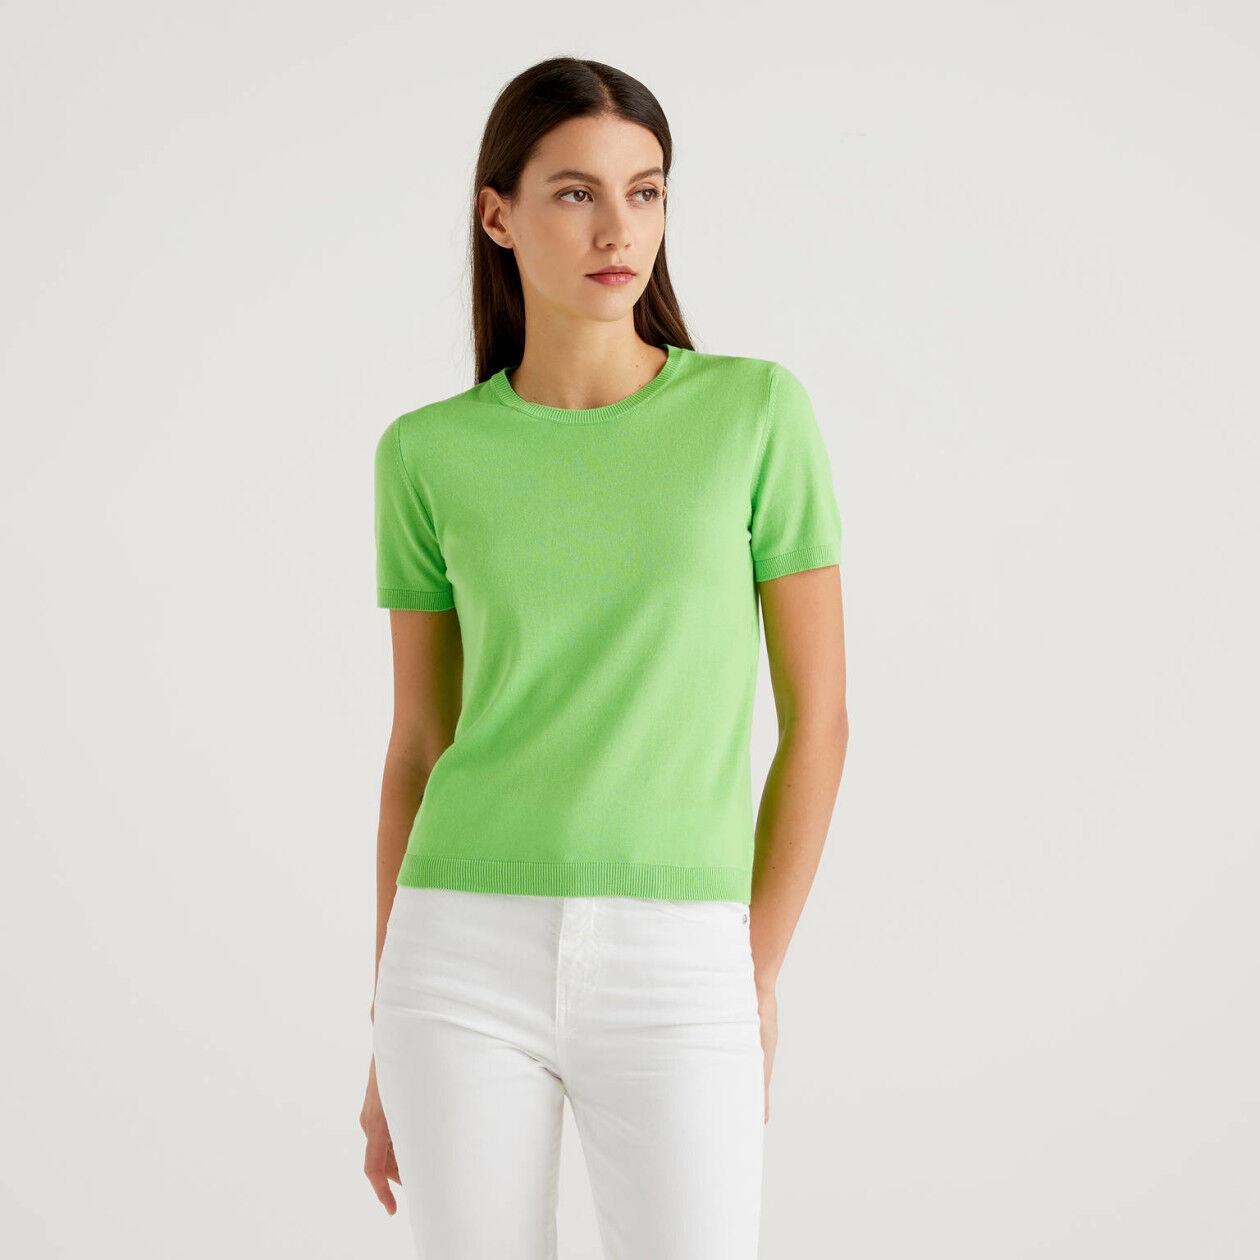 reparar llave inglesa frase  United Colors of Benetton - Web oficial